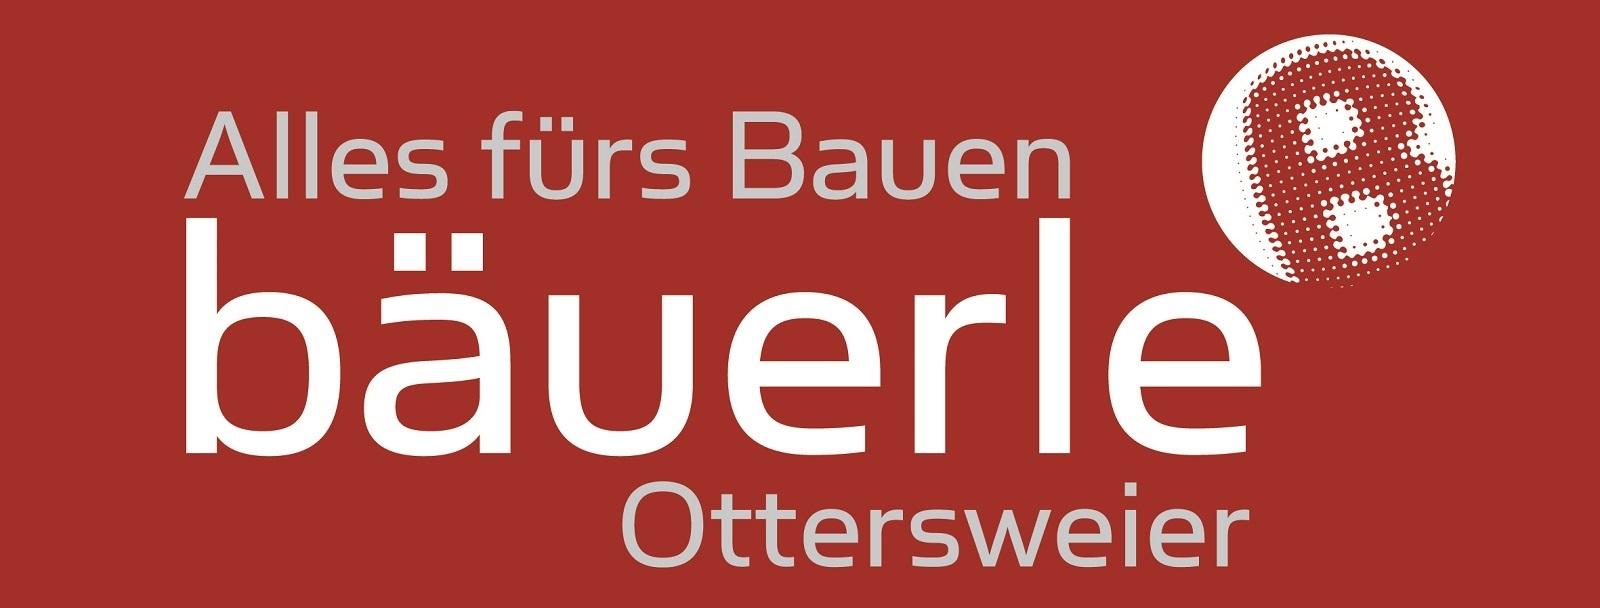 2018-04-09_Baeuerle